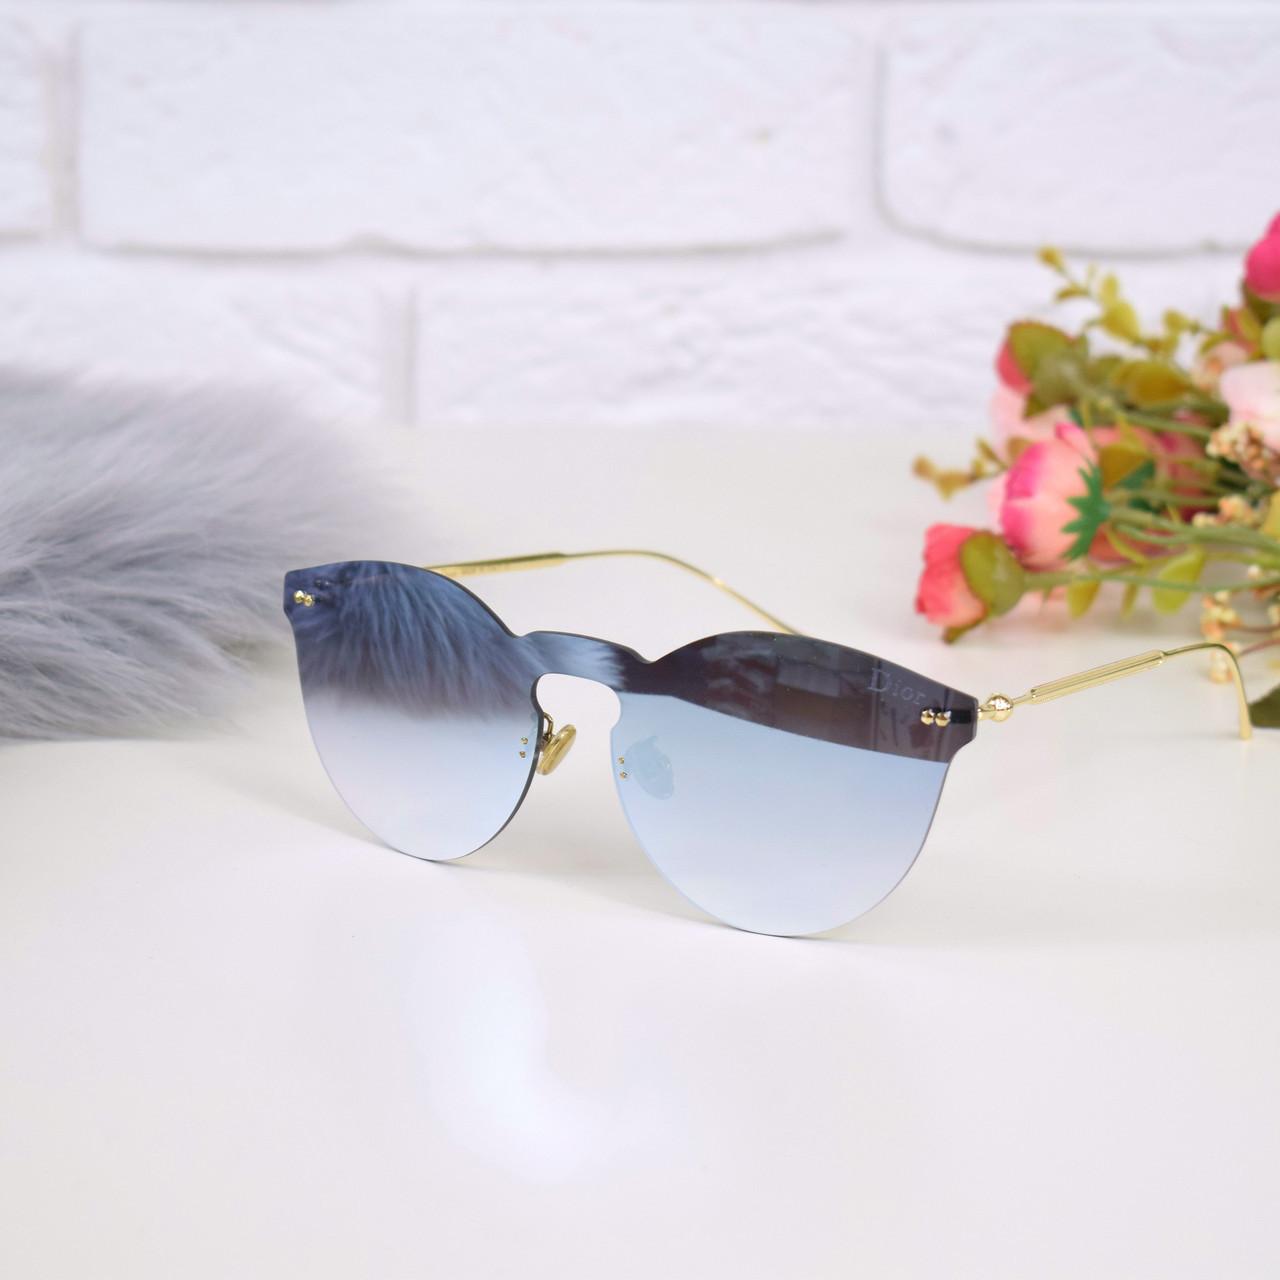 e4464e2e14d3 Очки женские от солнца в стиле Dior голубые, магазин очков: продажа ...